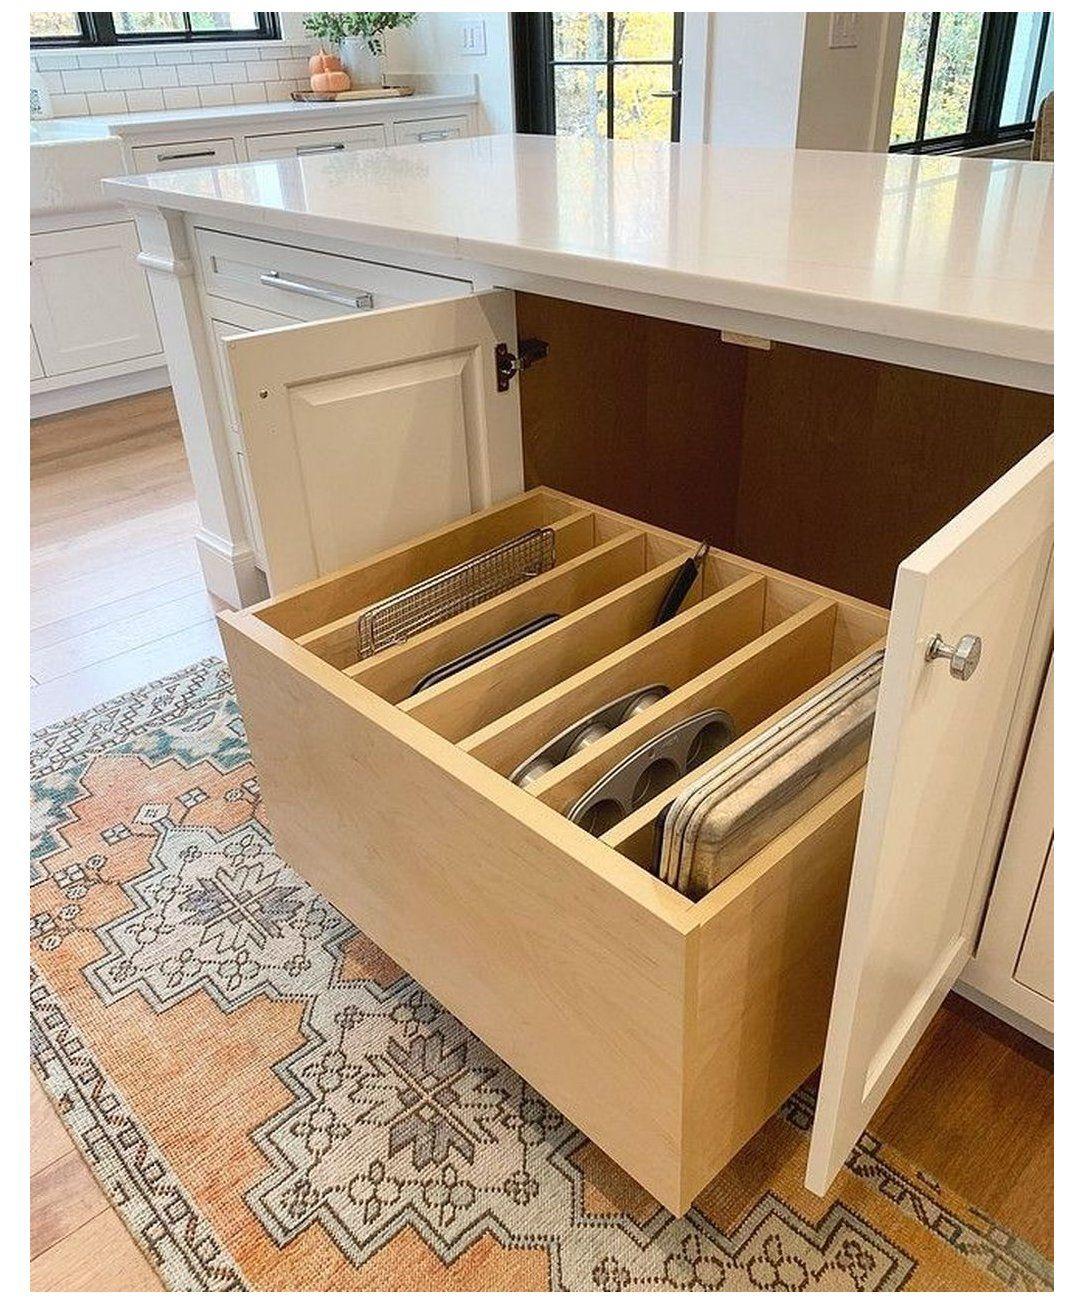 30 Awesome Small Kitchen Storage Ideas - Image 11 of 30 #kitchenstorage